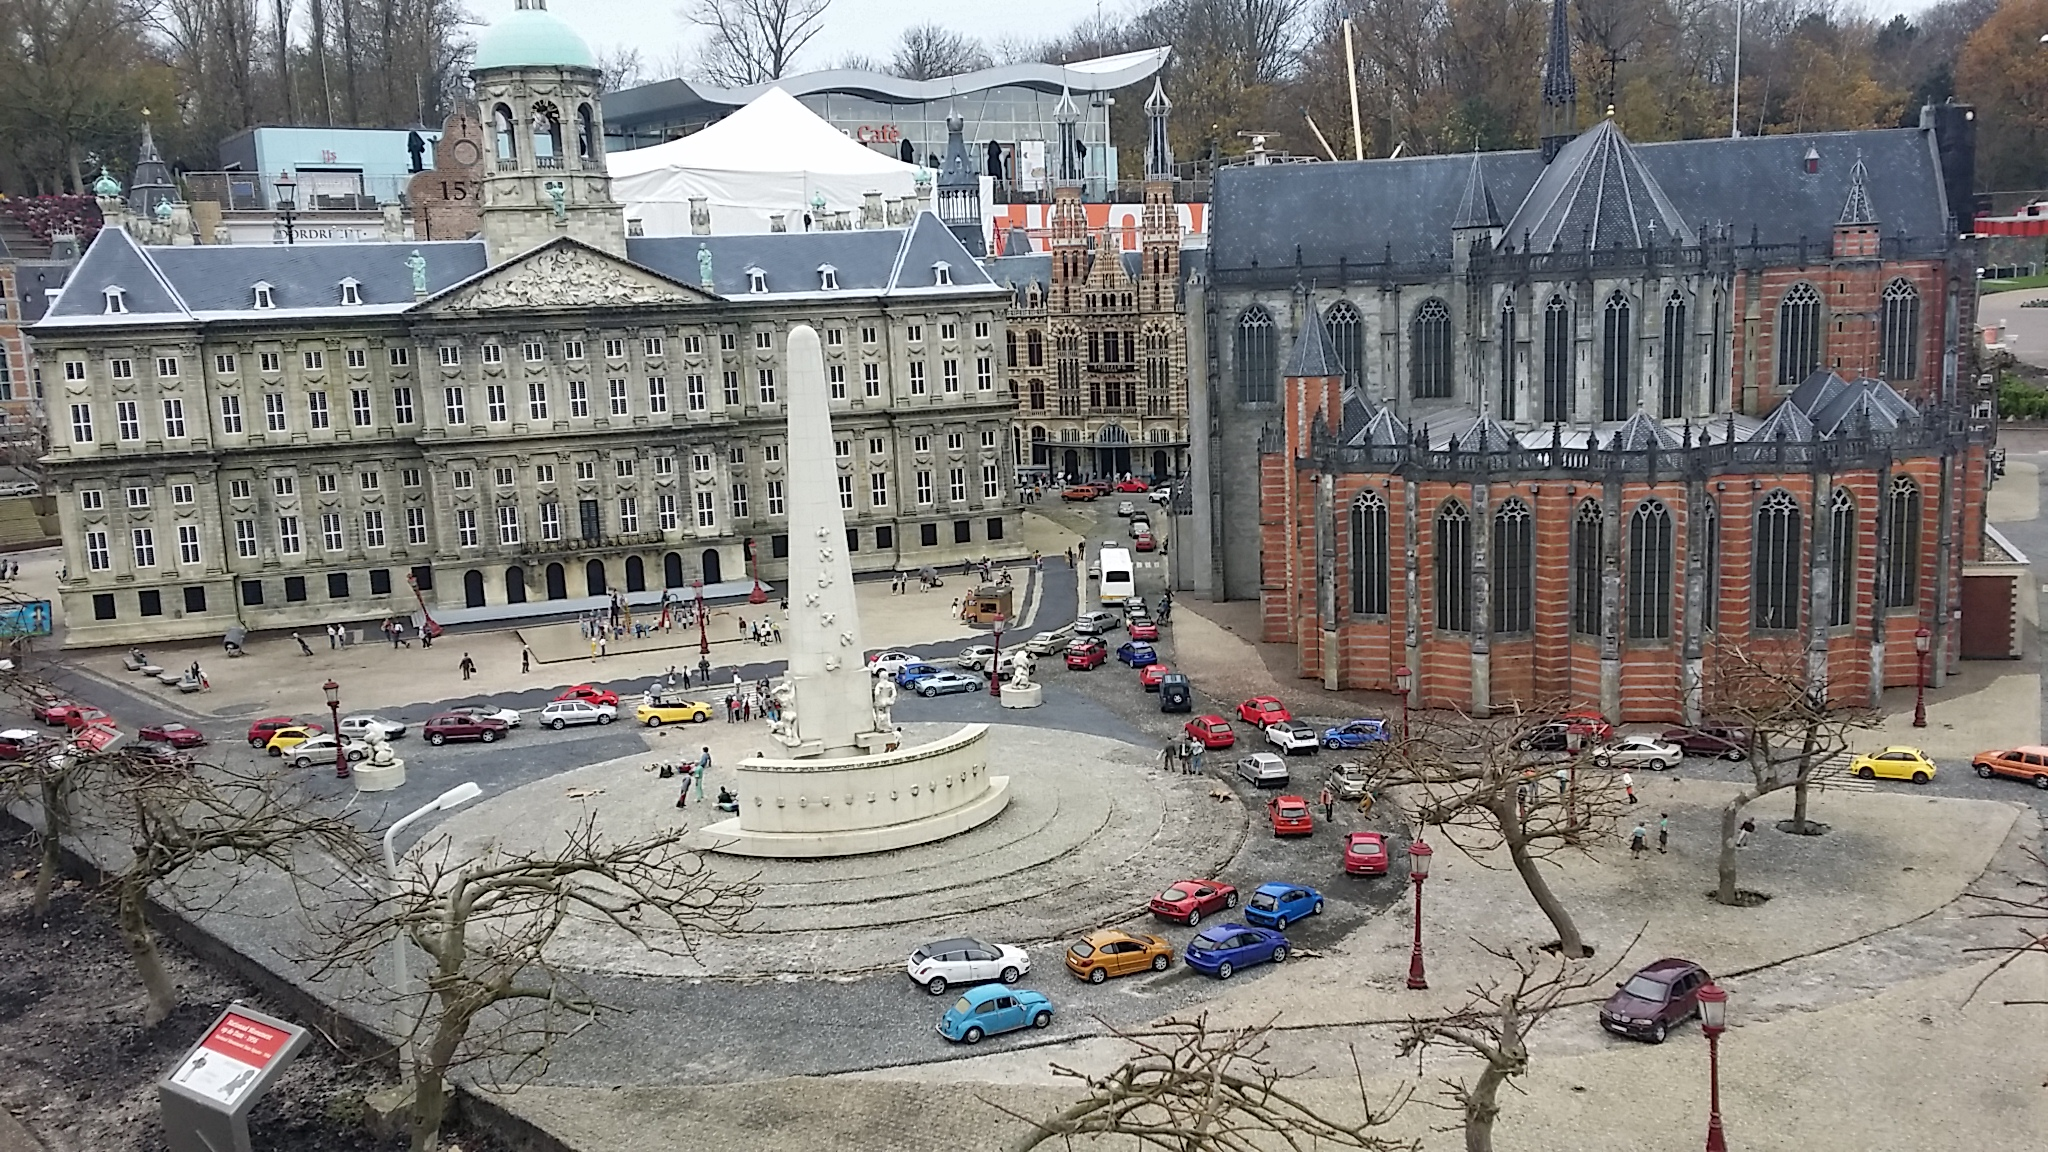 De Dam Amsterdam, Damrak, Pusat Kota Amsterdam, Royal Palace, Madurodam, Serbalanda Tour, Eka Tanjung